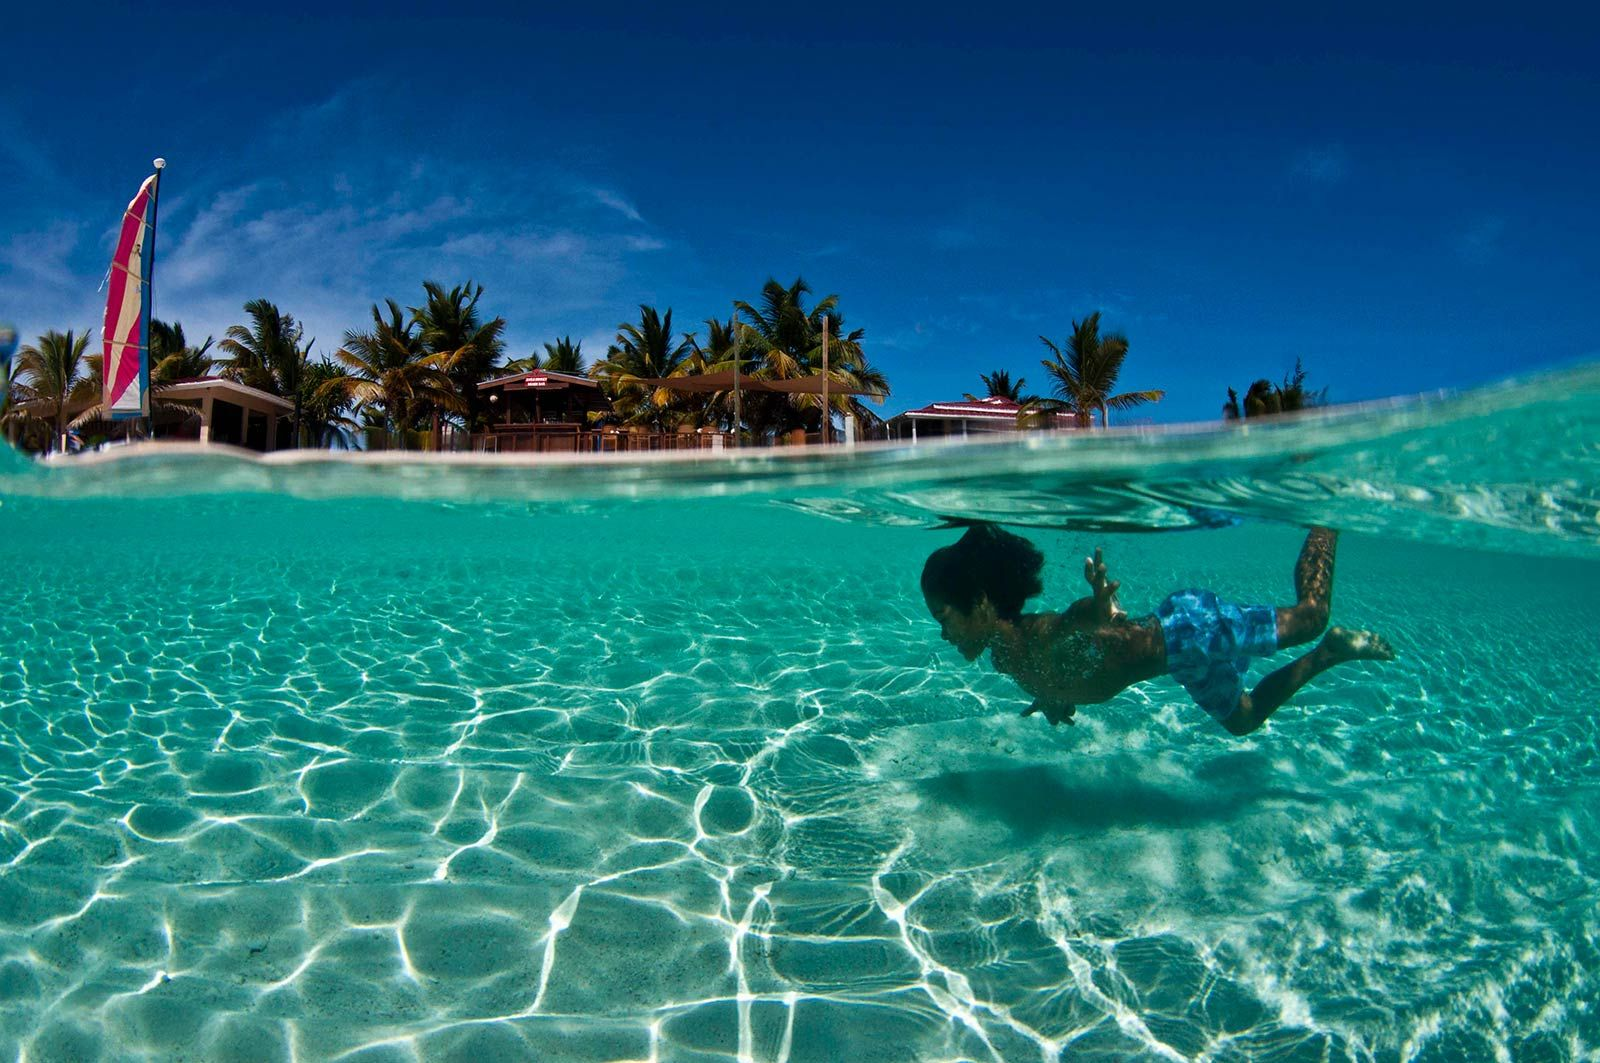 Caribbean Diving Photo Gallery Bohio Dive Resort Bohio Dive Resort Dive Resort Caribbean Hotels Grand Turk